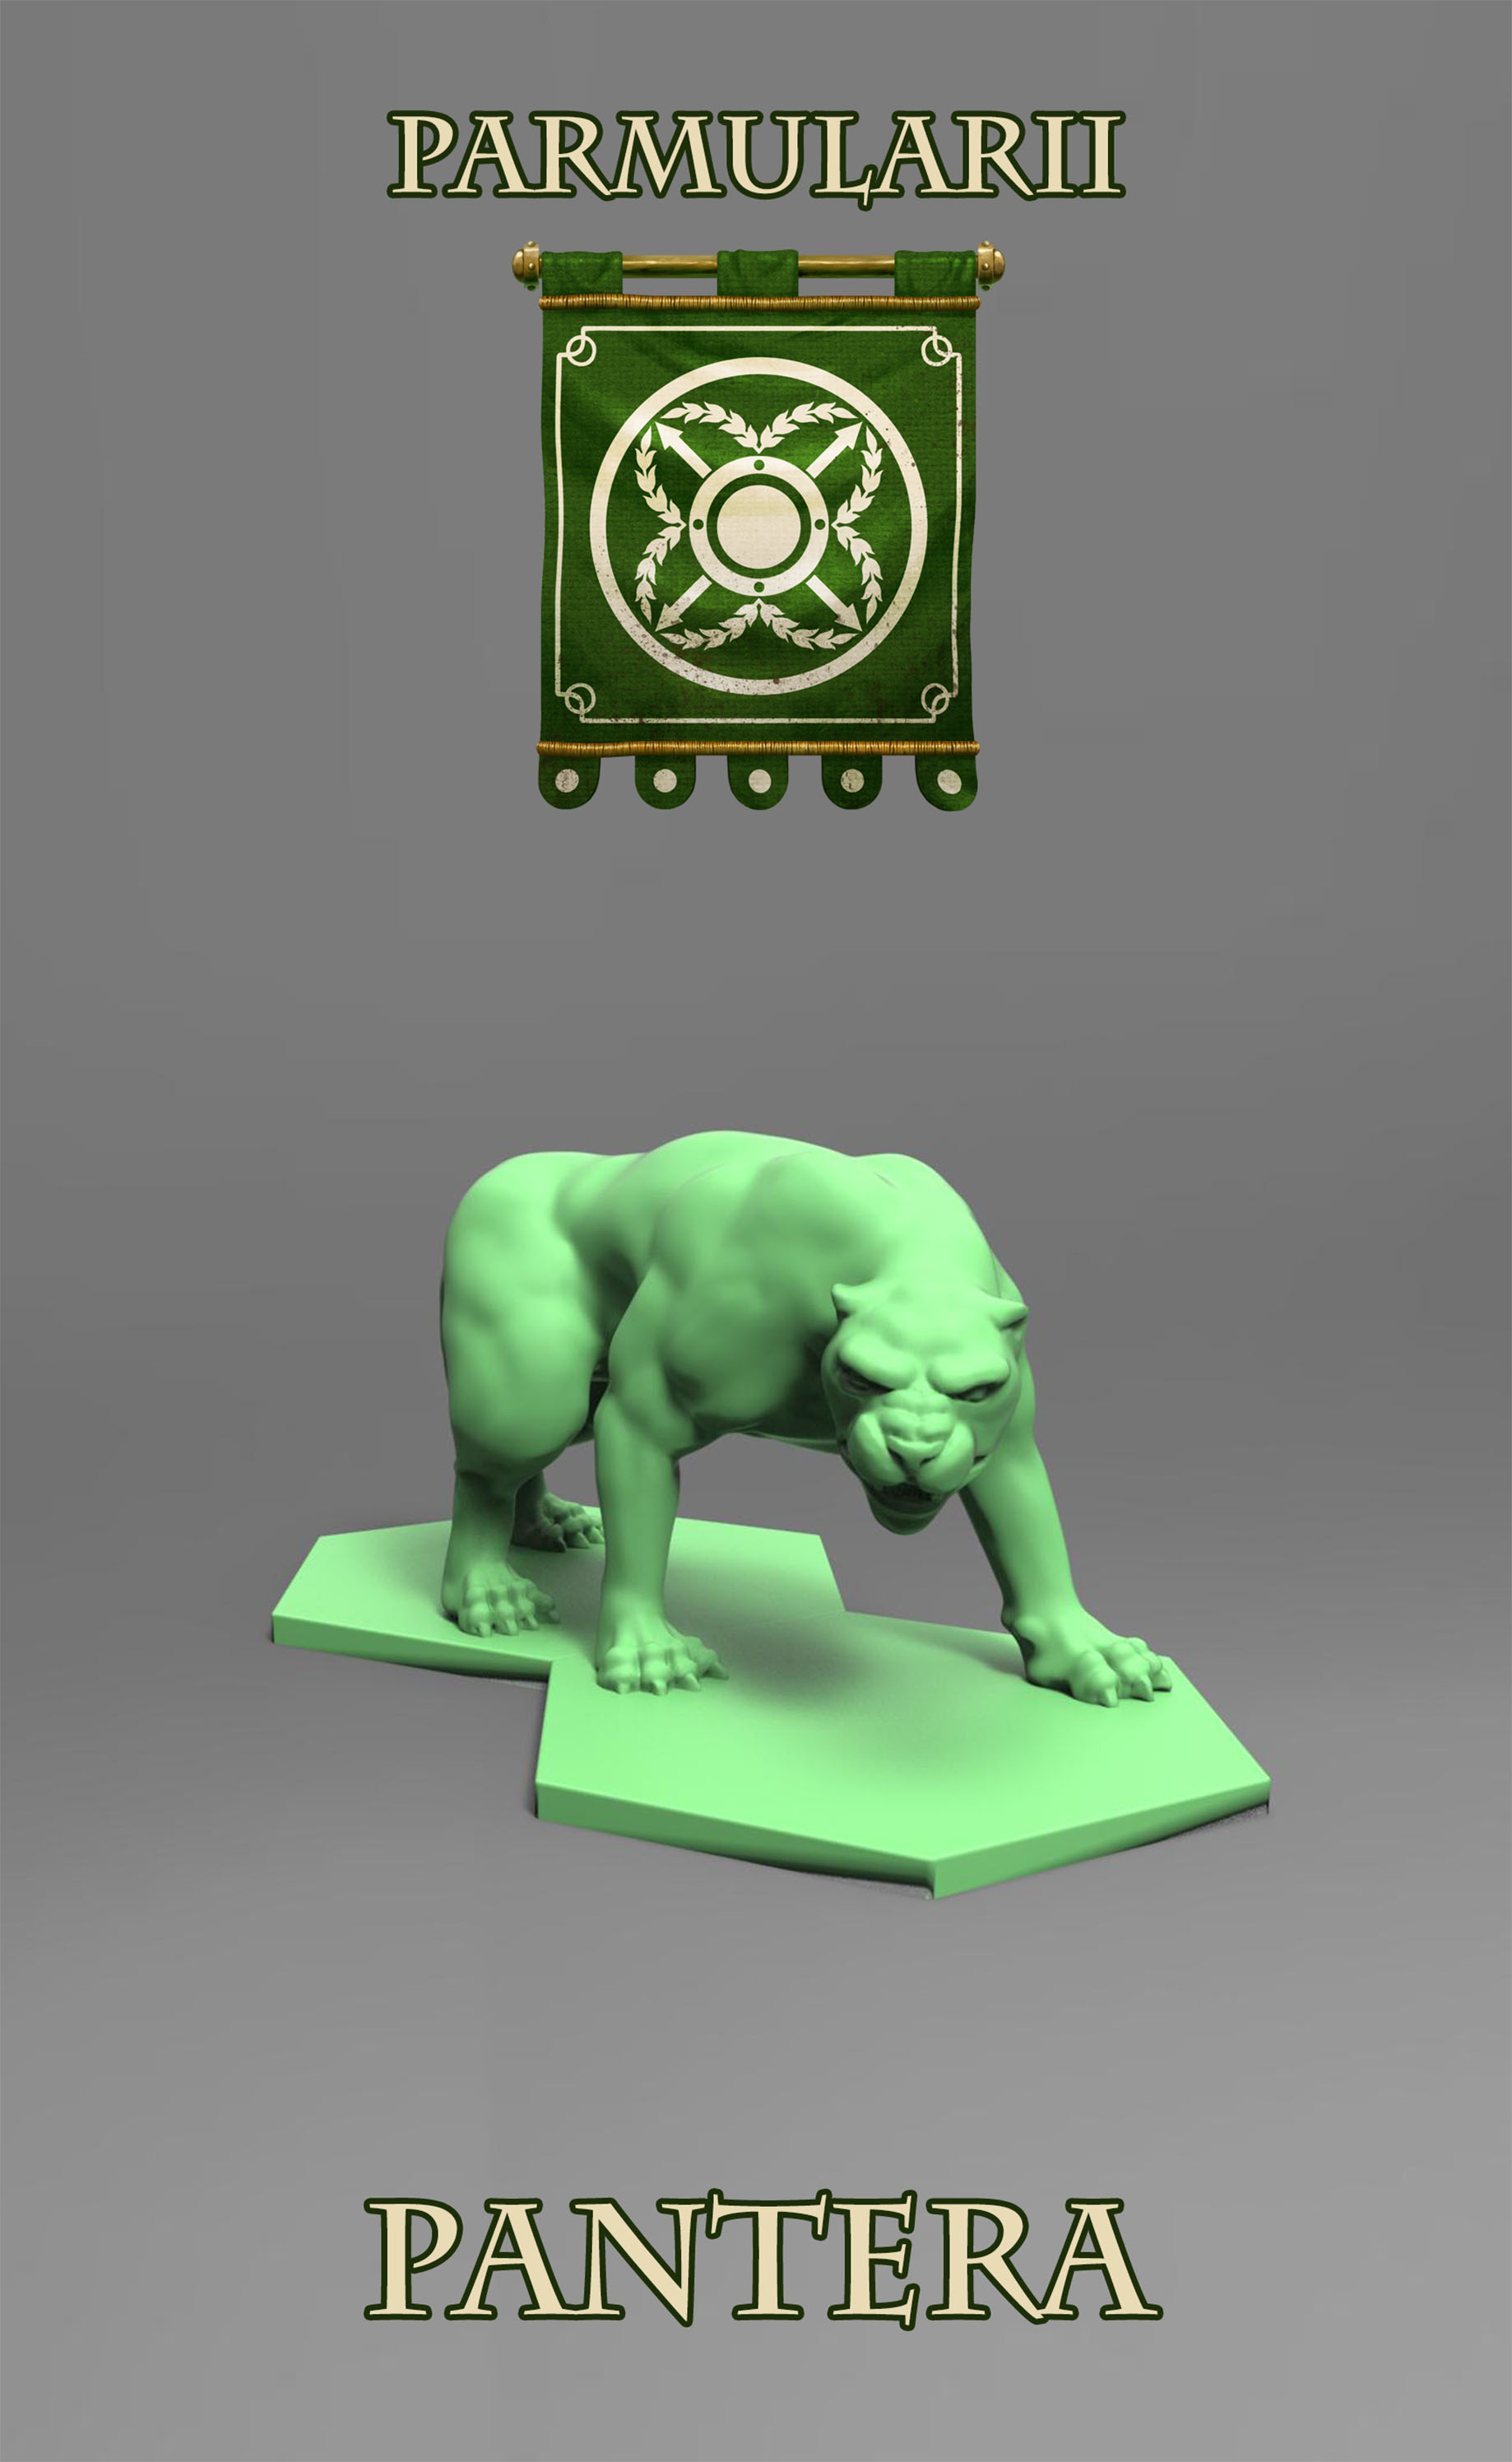 Pantera (Parmularii)